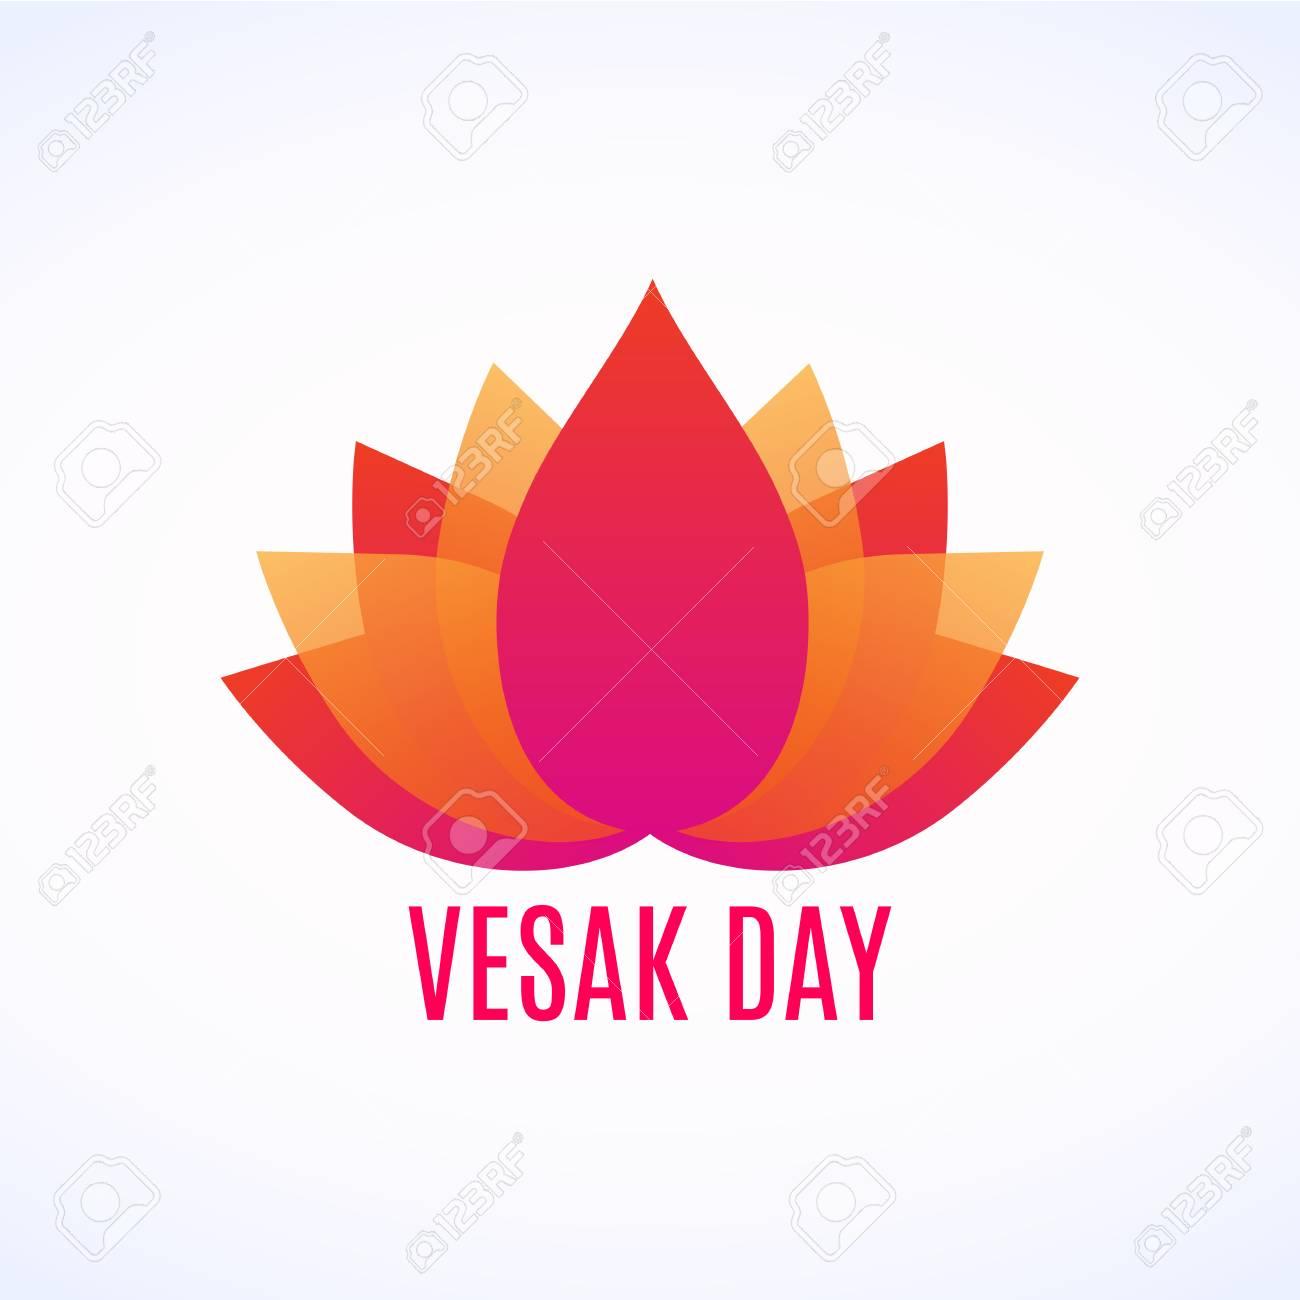 Abstract lotus flower logo with vesak day lettering royalty free abstract lotus flower logo with vesak day lettering stock vector 99960227 izmirmasajfo